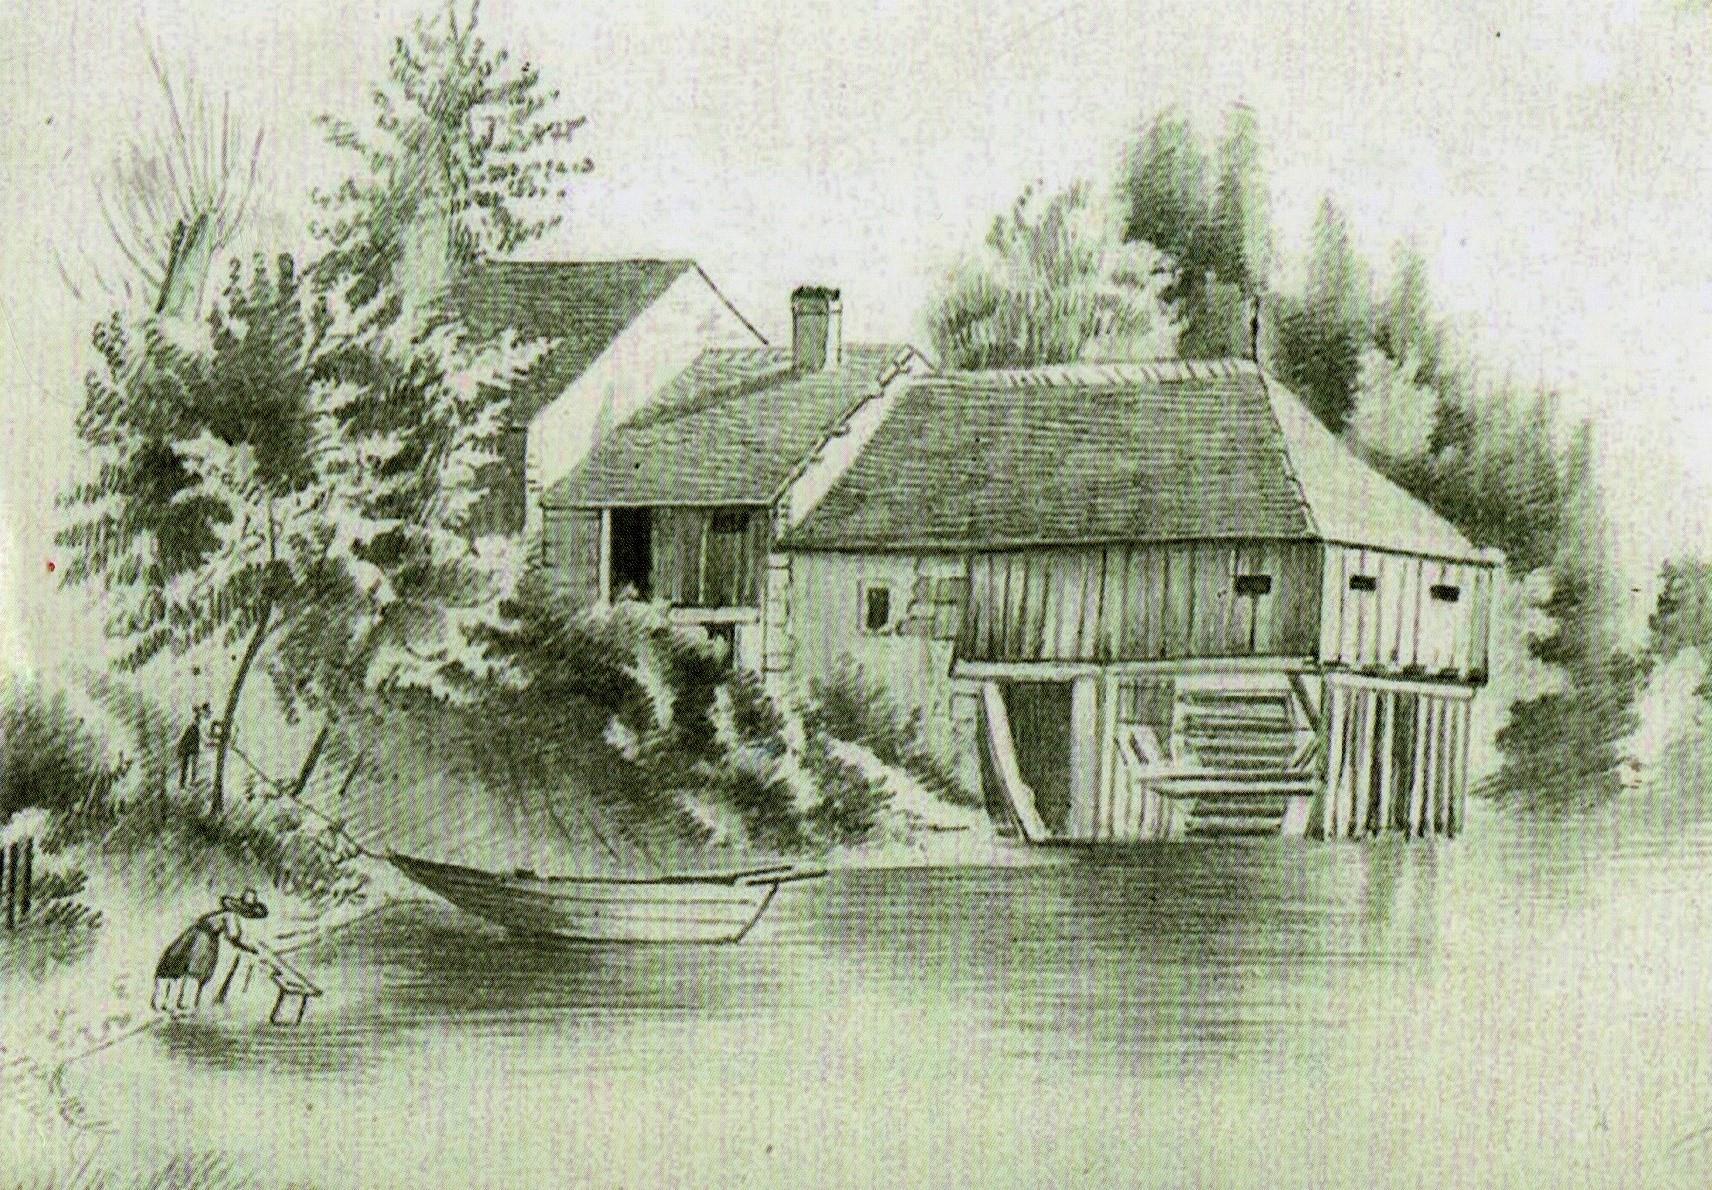 Le moulin Oltramare